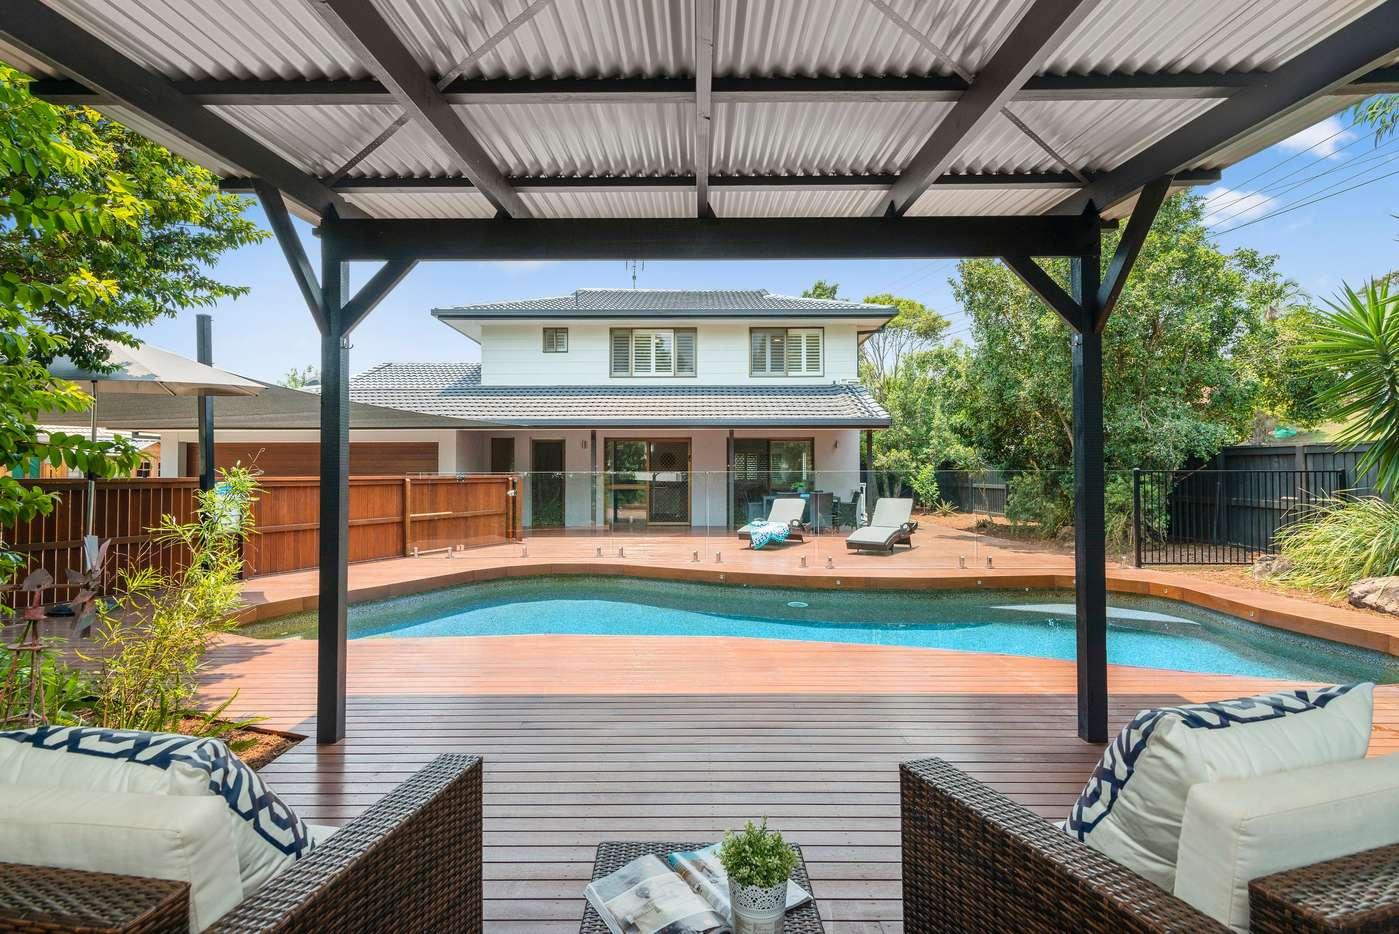 Main view of Homely house listing, 1 Jendi Court, Tugun, QLD 4224